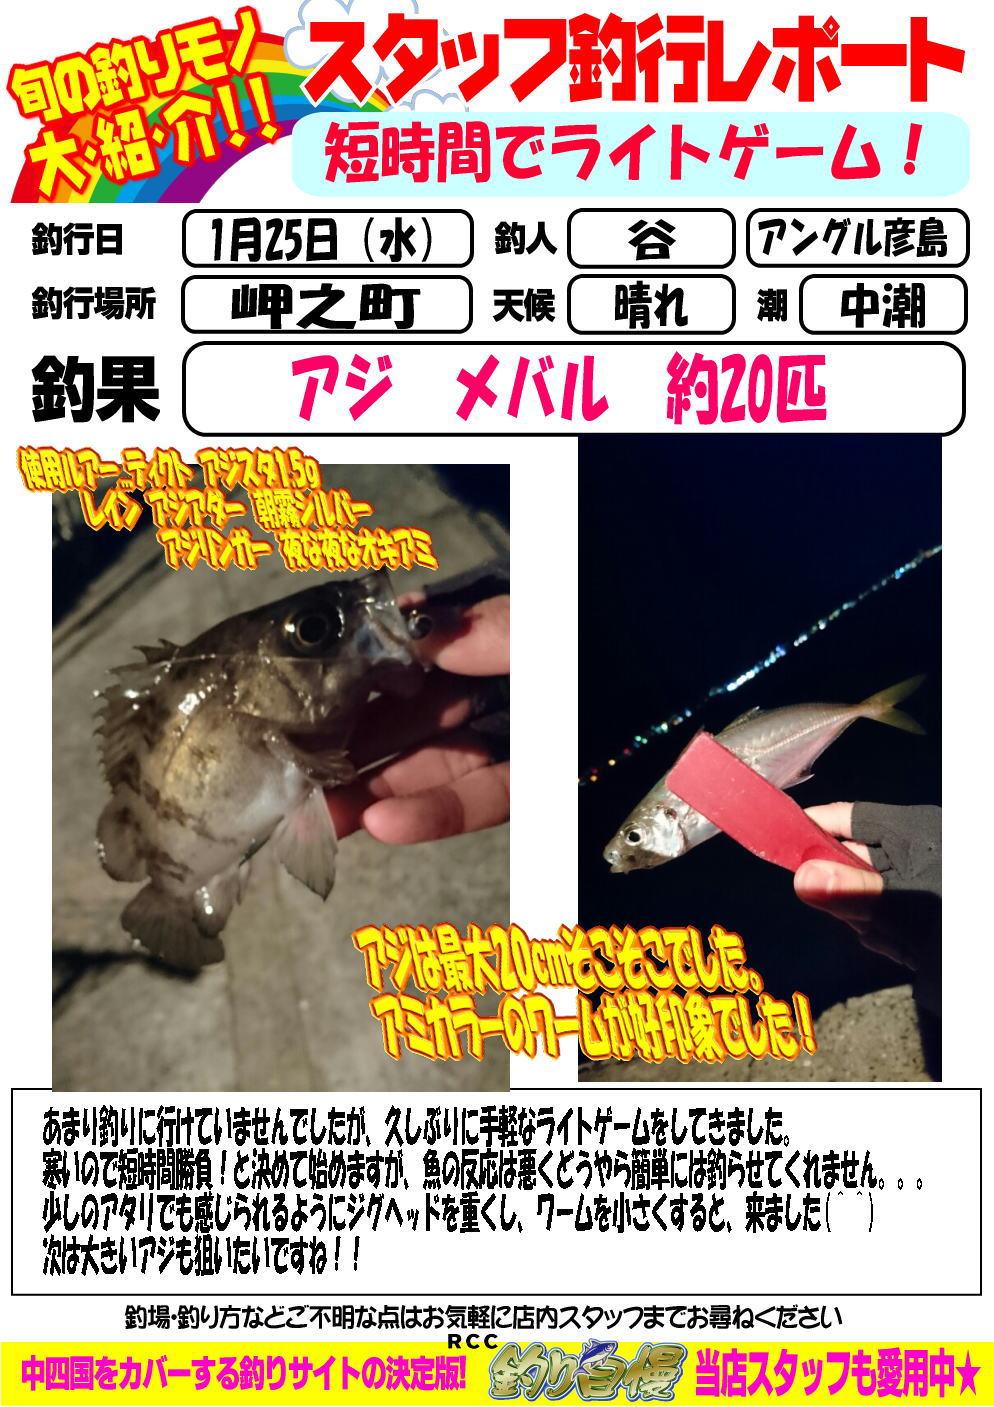 http://www.e-angle.co.jp/shop/blog/blog-20170125-hikoshima-ajimeba.jpg